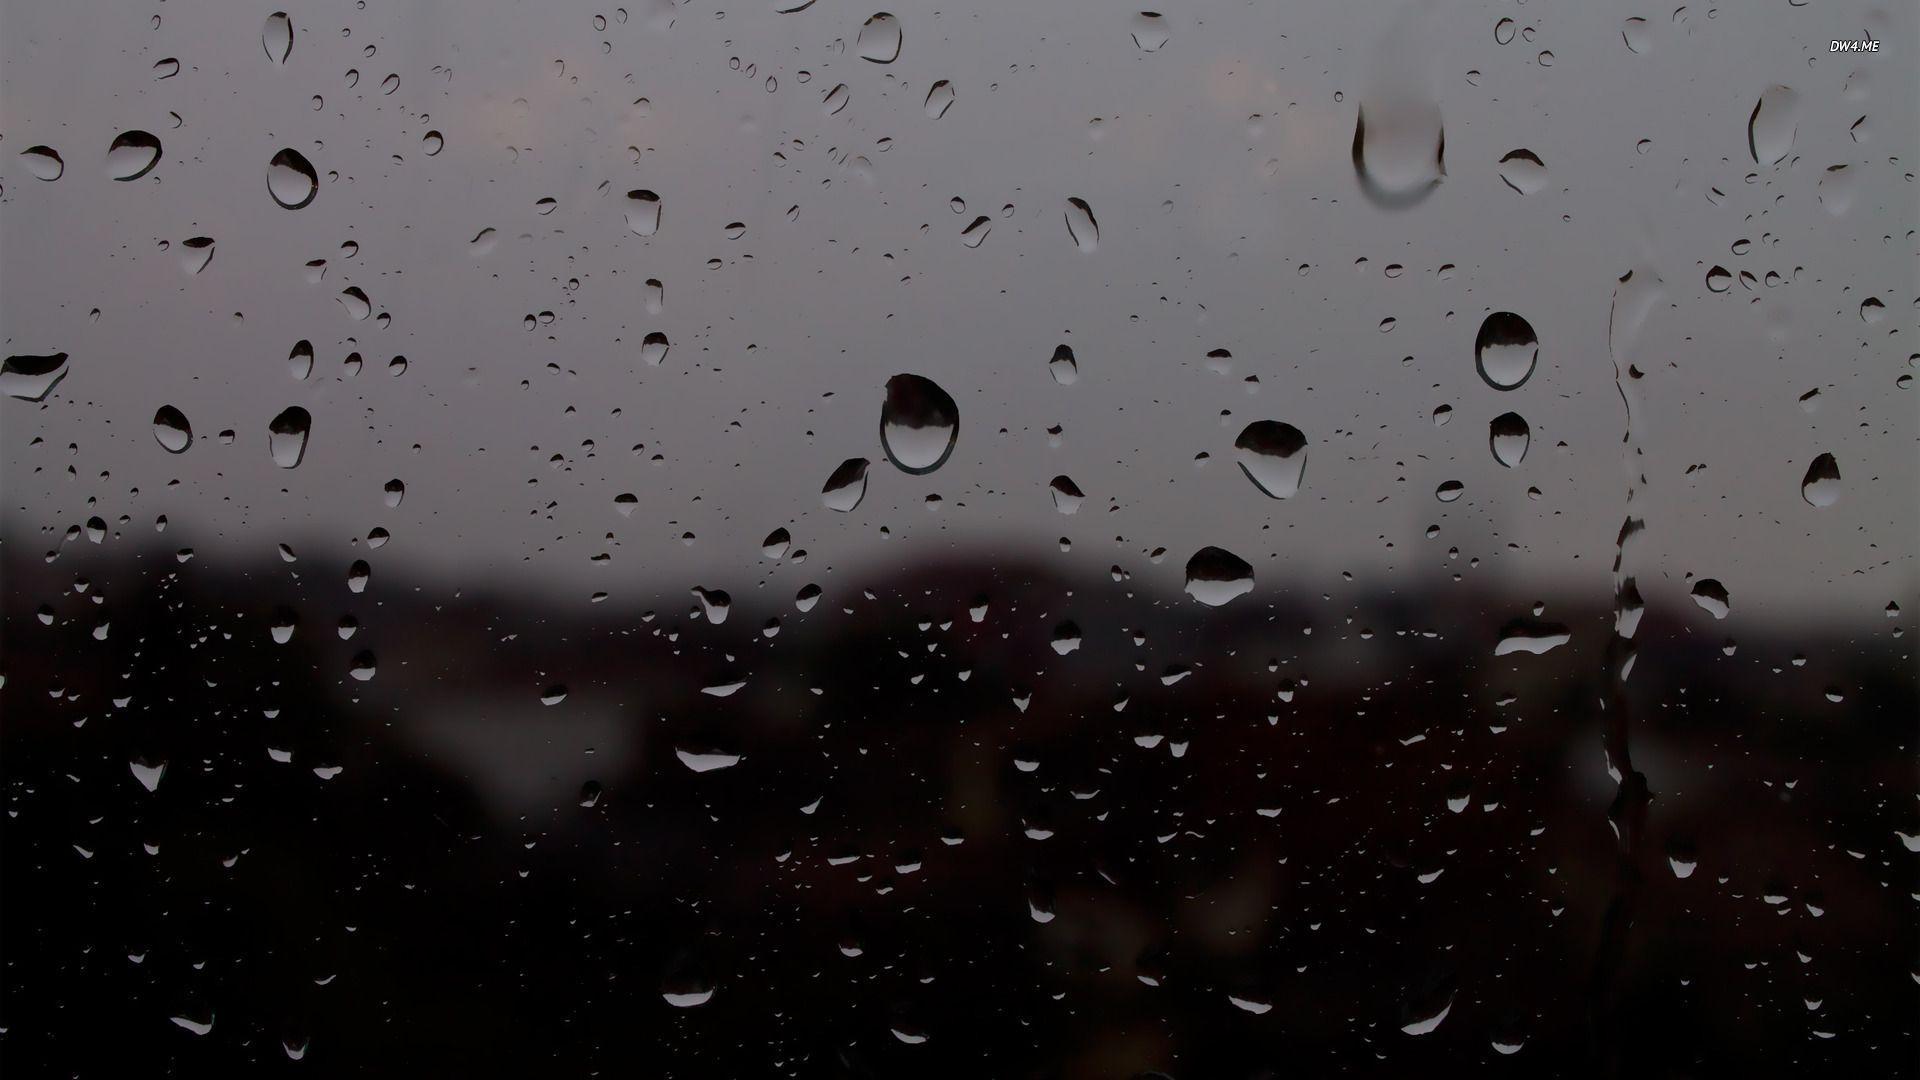 Plain glass windows - Wallpapers Of Raindrops Wallpaper Cave